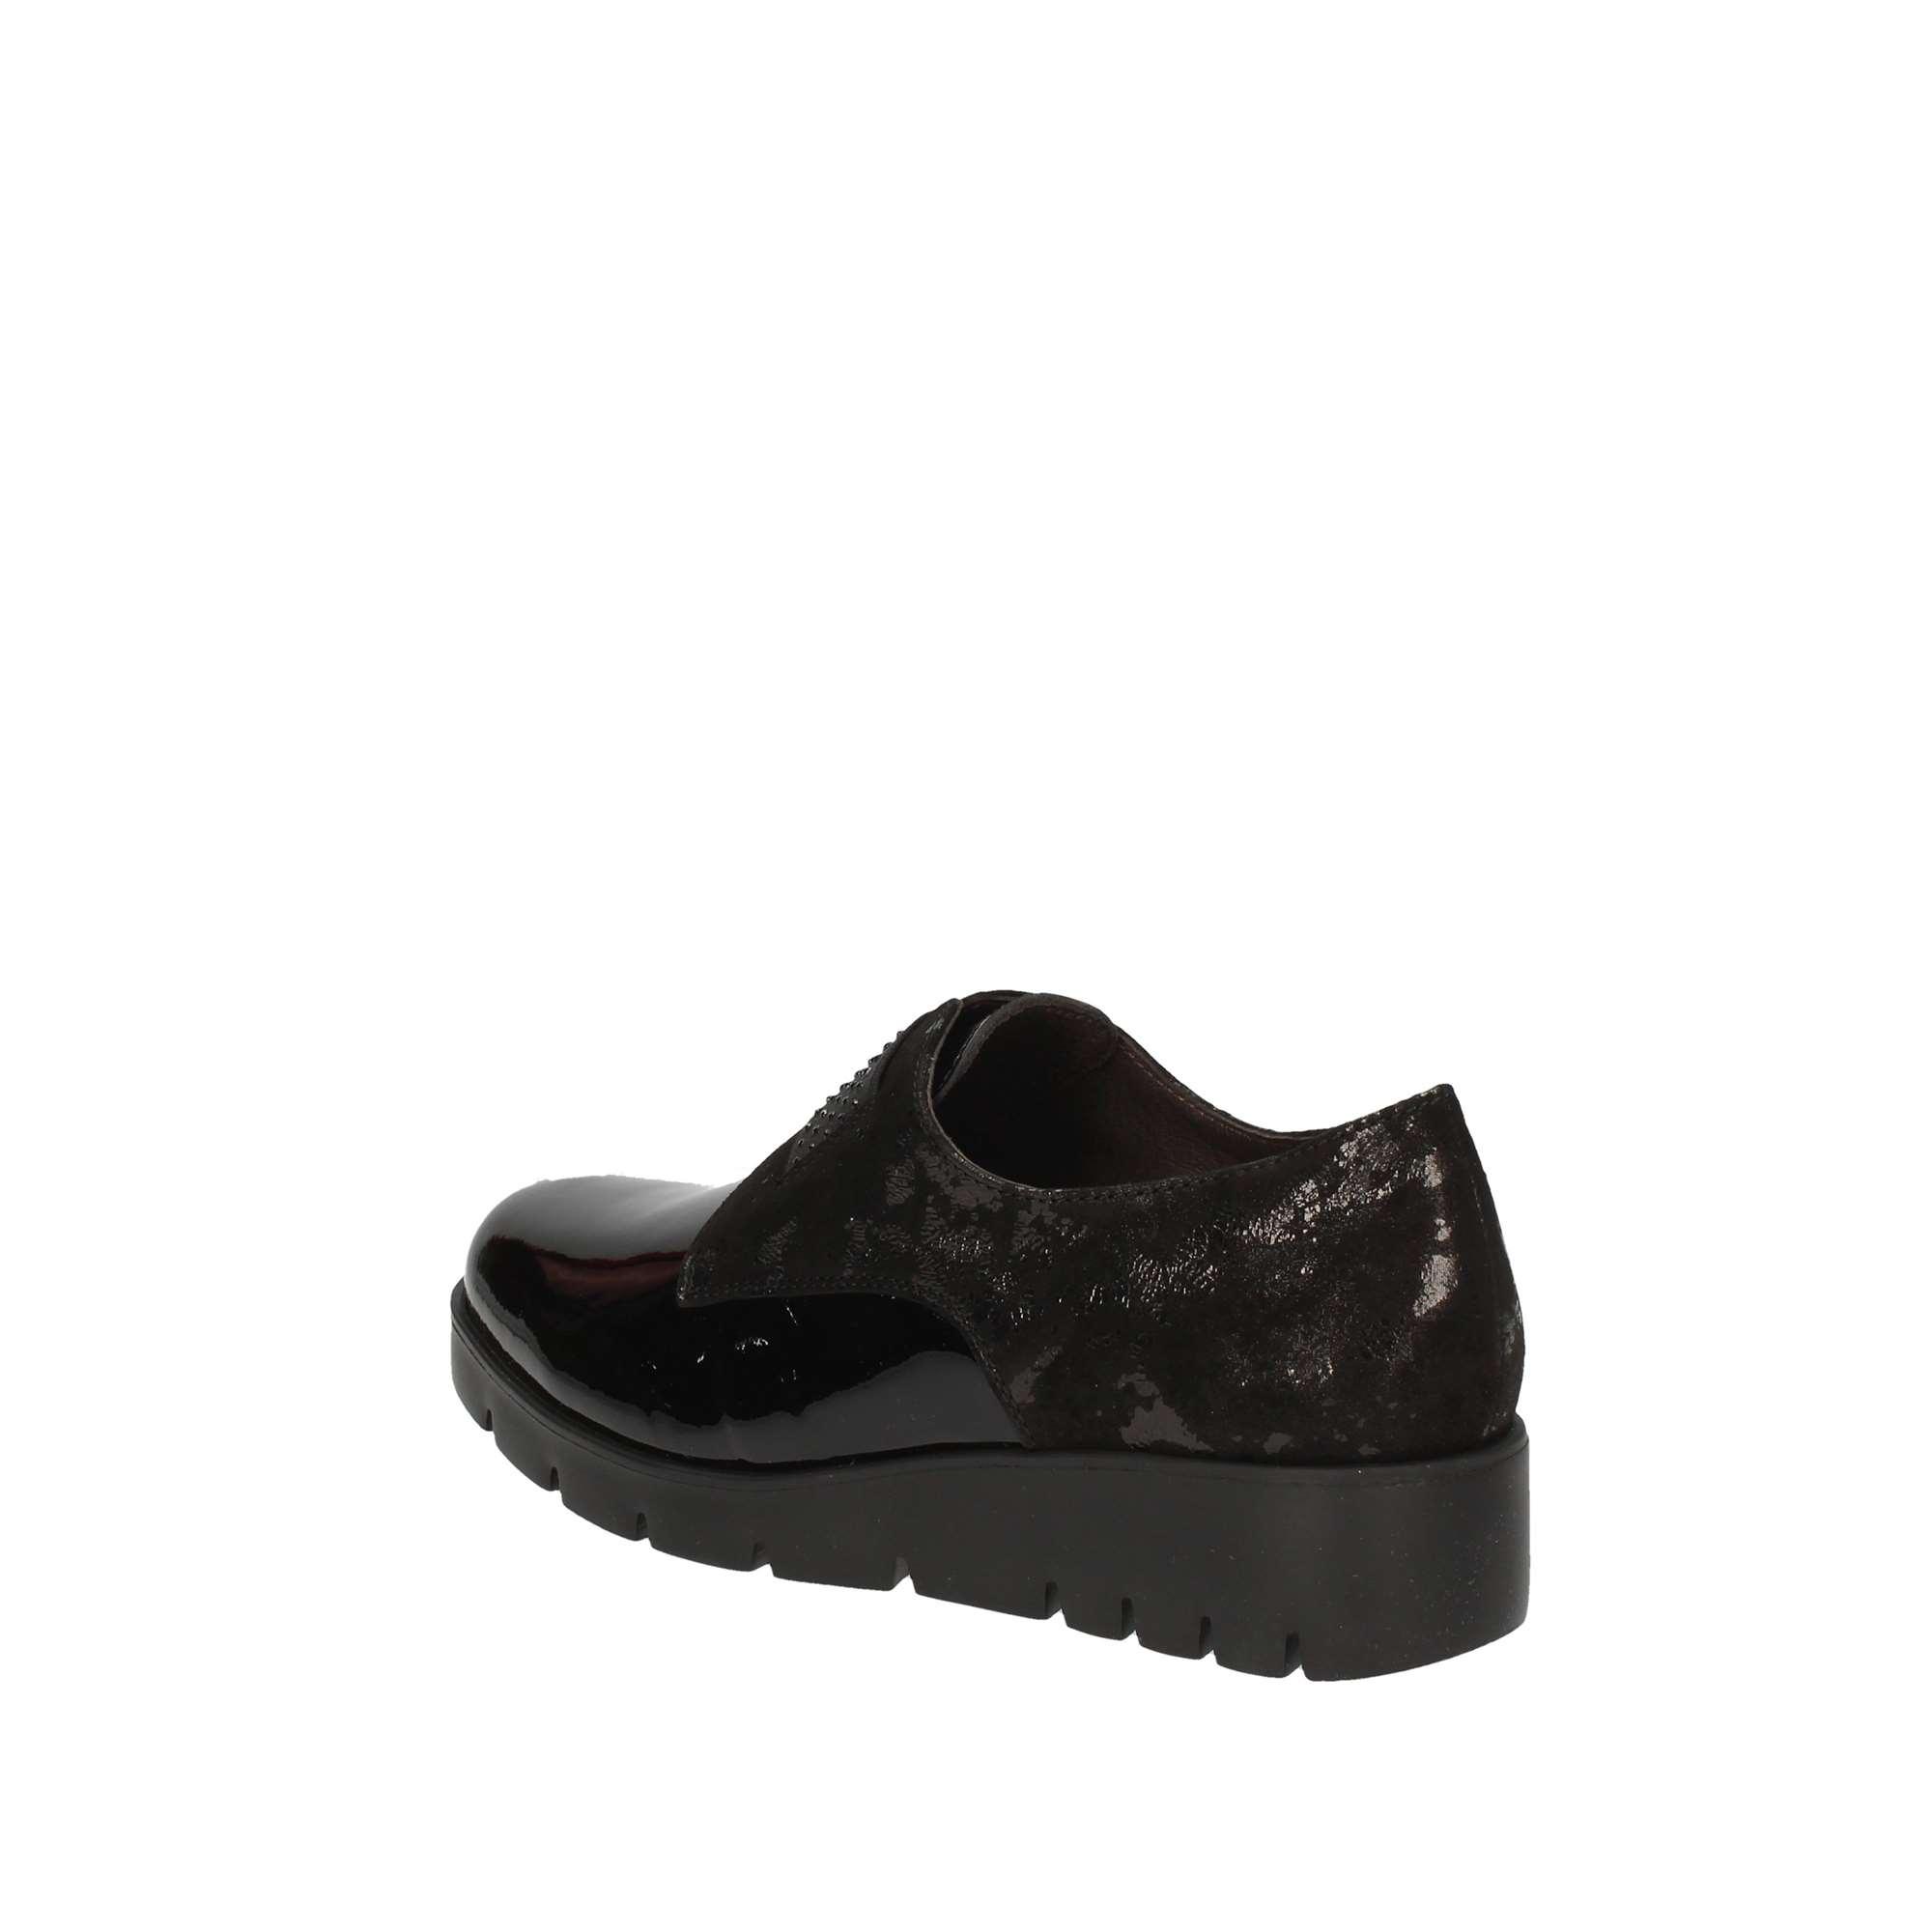 zapatos SUSIMODA Stringate SUSIMODA zapatos 9806 73 negro STRINGATA mujer Autunno Inverno e03de8